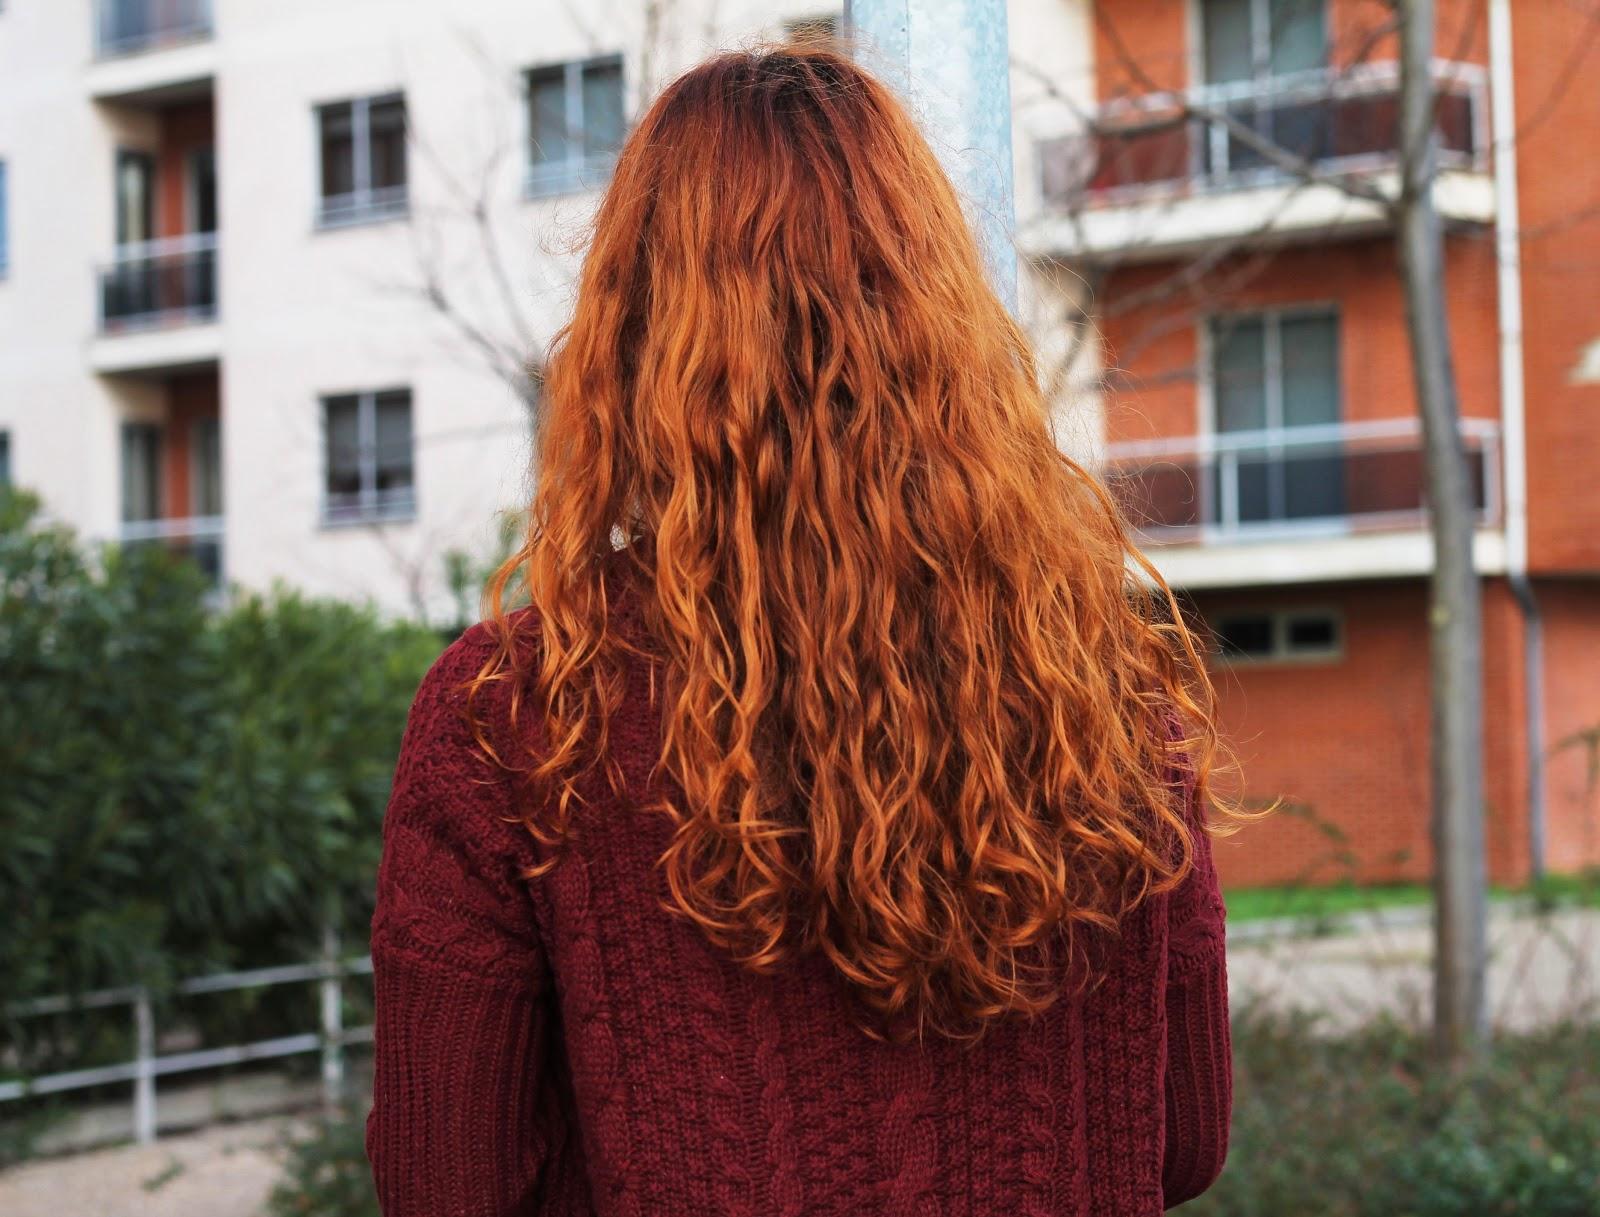 http://1.bp.blogspot.com/-YpL_BtOB-Kg/UXgfNbsdTAI/AAAAAAAAkuU/asrI_wXVCSc/s1600/red+hair+style+oxblood.jpg